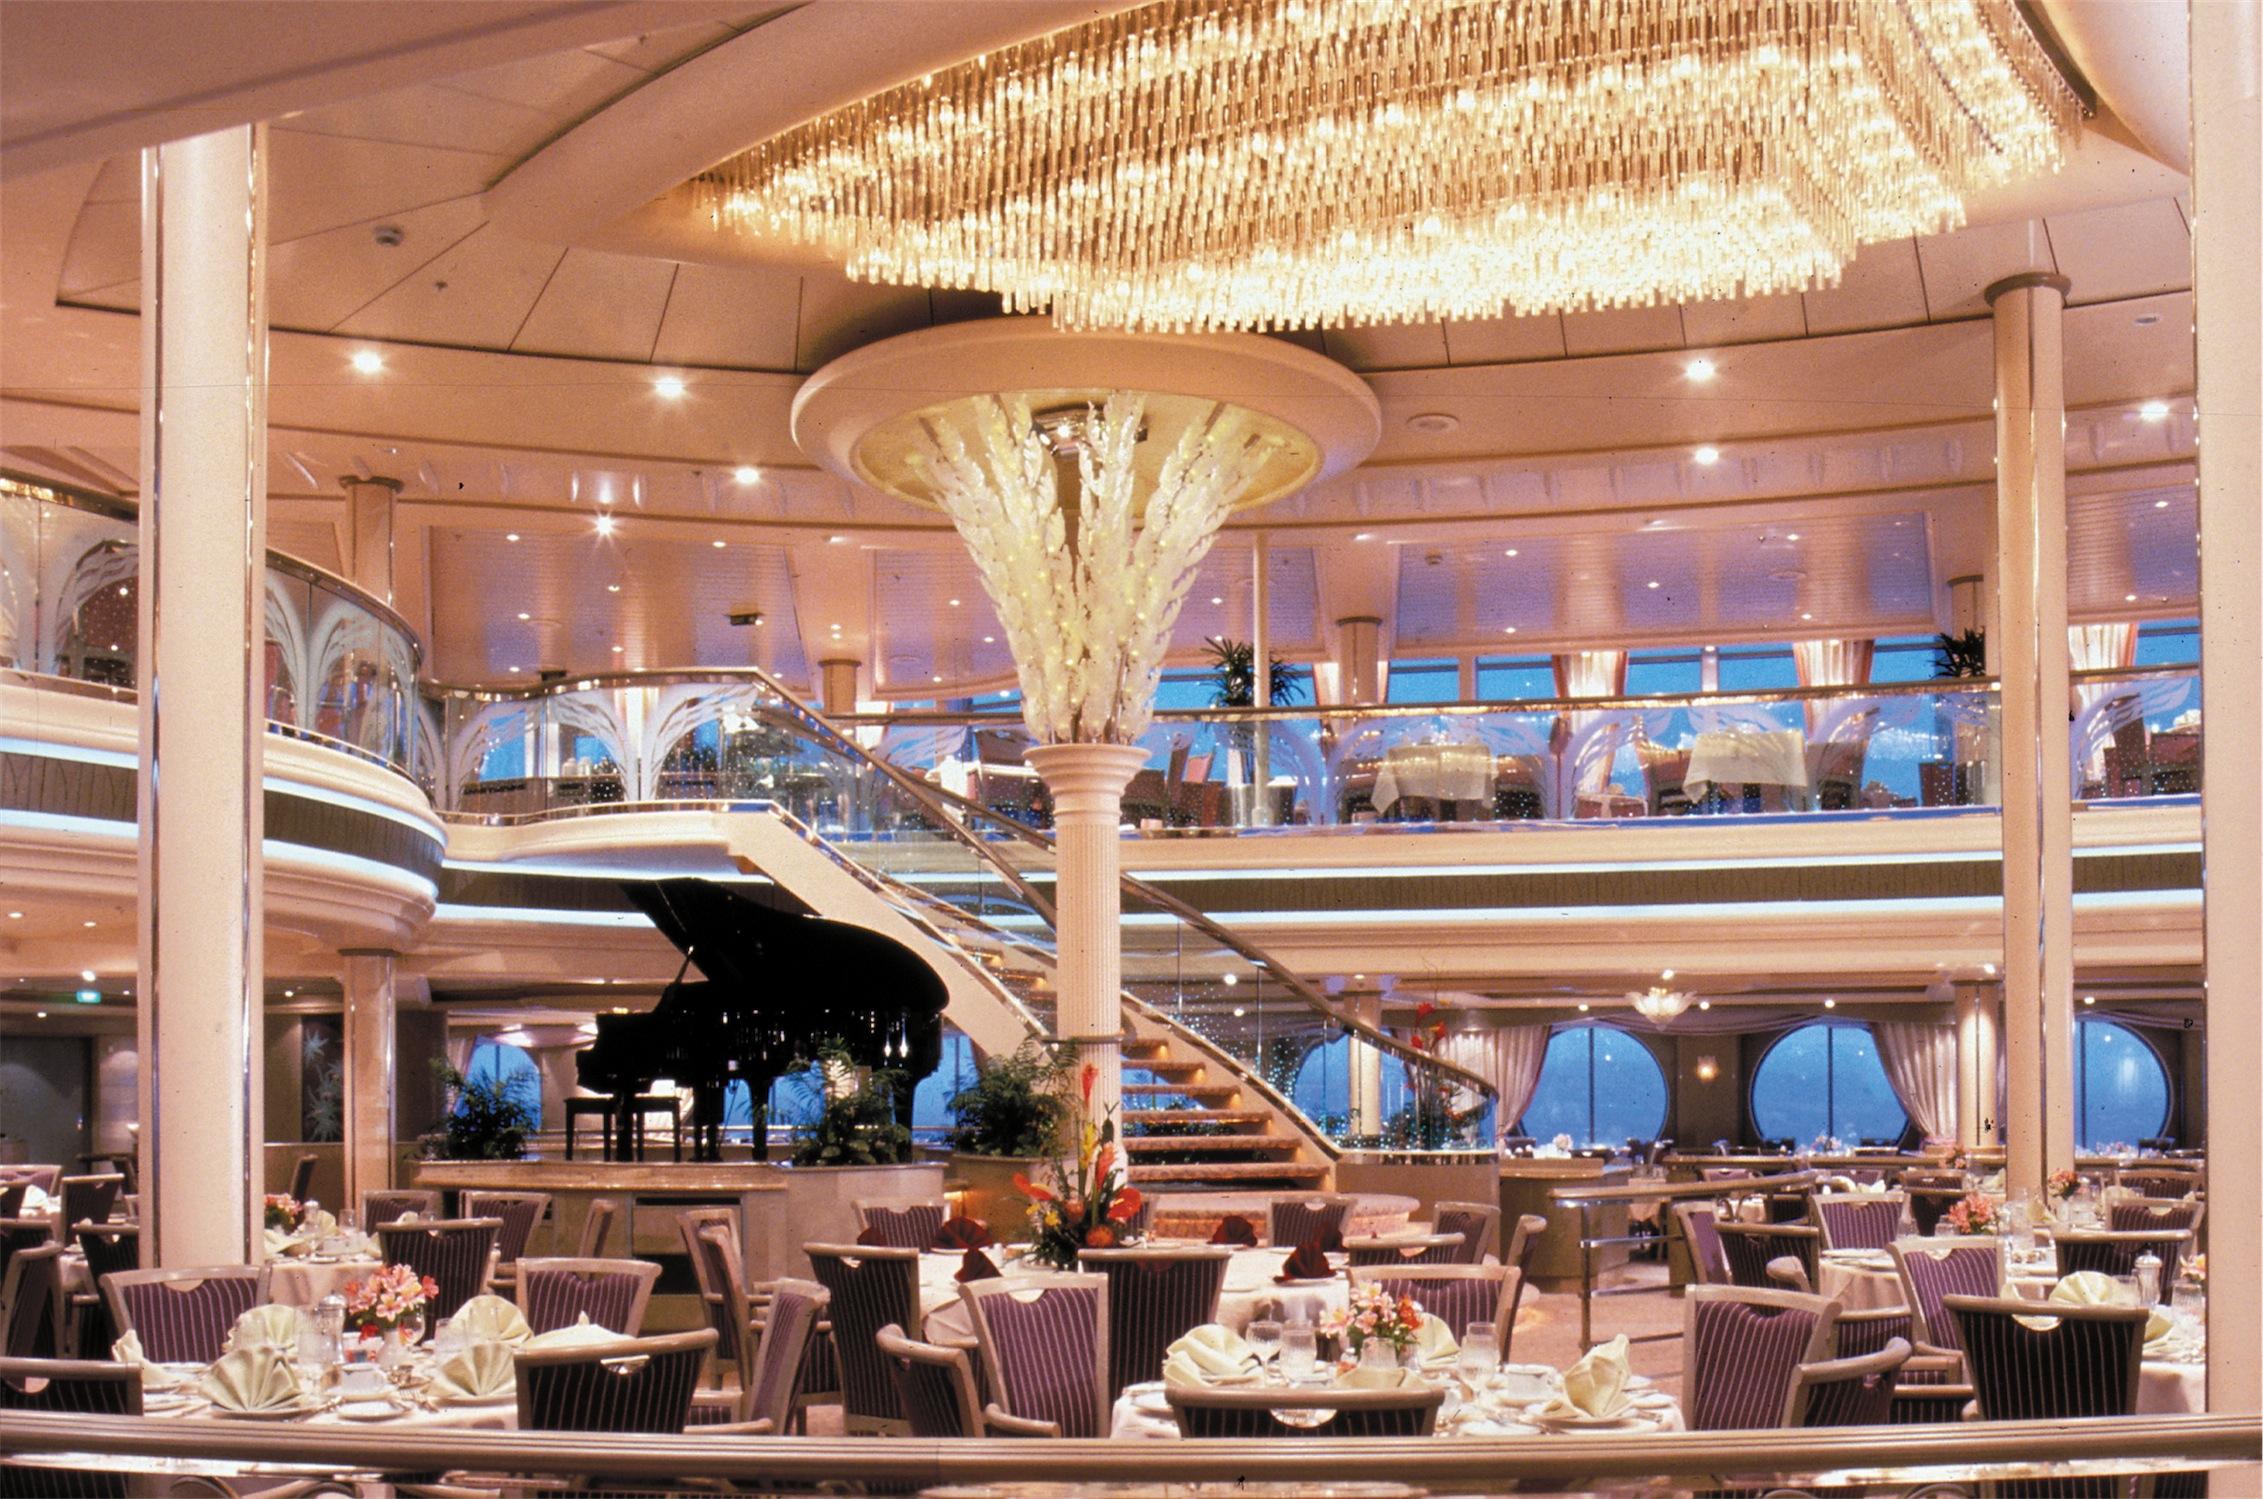 Royal Caribbean International Rhapsody of the Seas Interior Dining Room.jpg